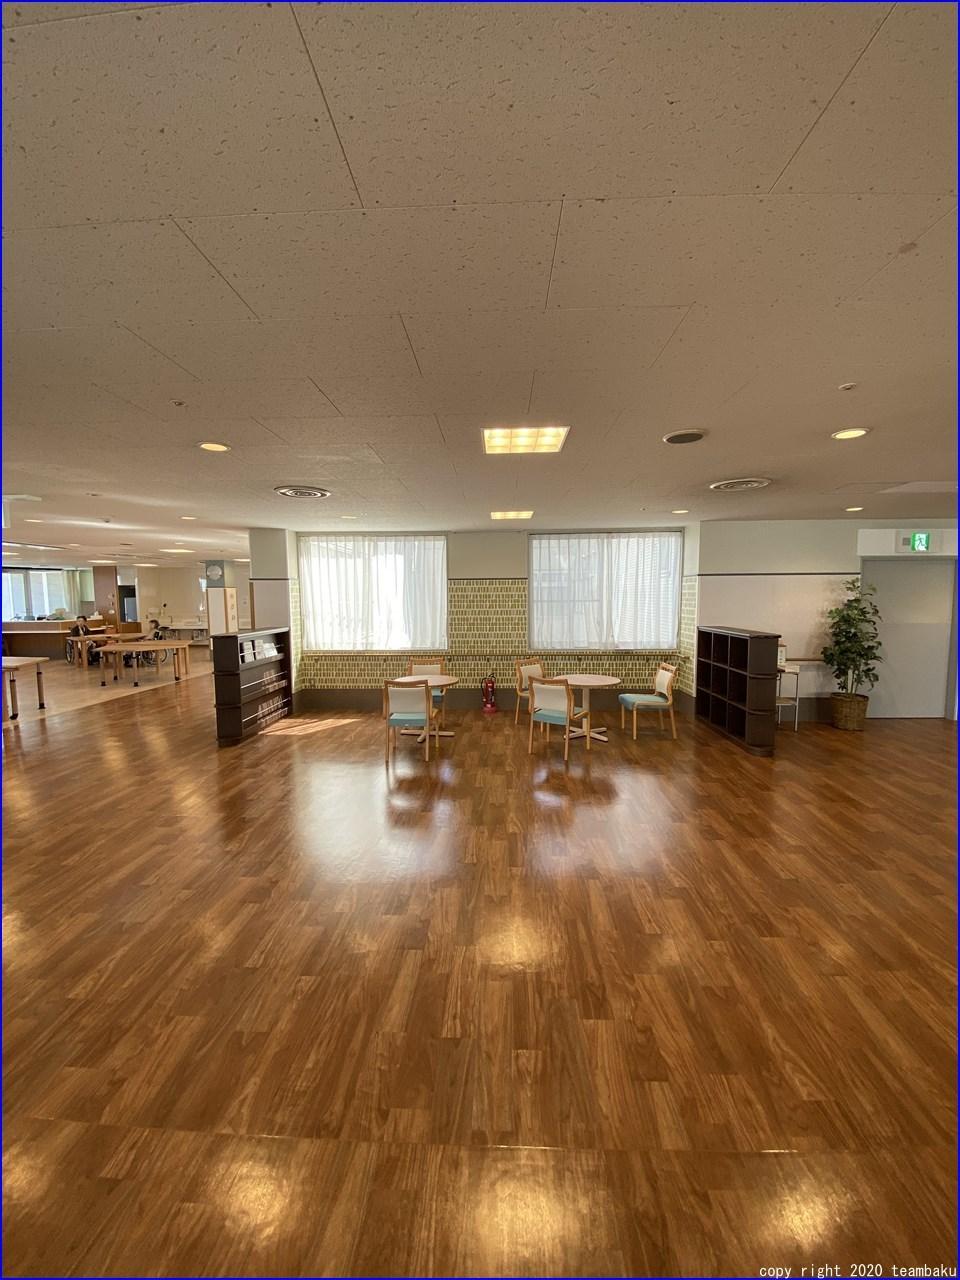 N病院グループ N病院東館 介護医療院 転換改修工事 4_c0376508_10424450.jpg